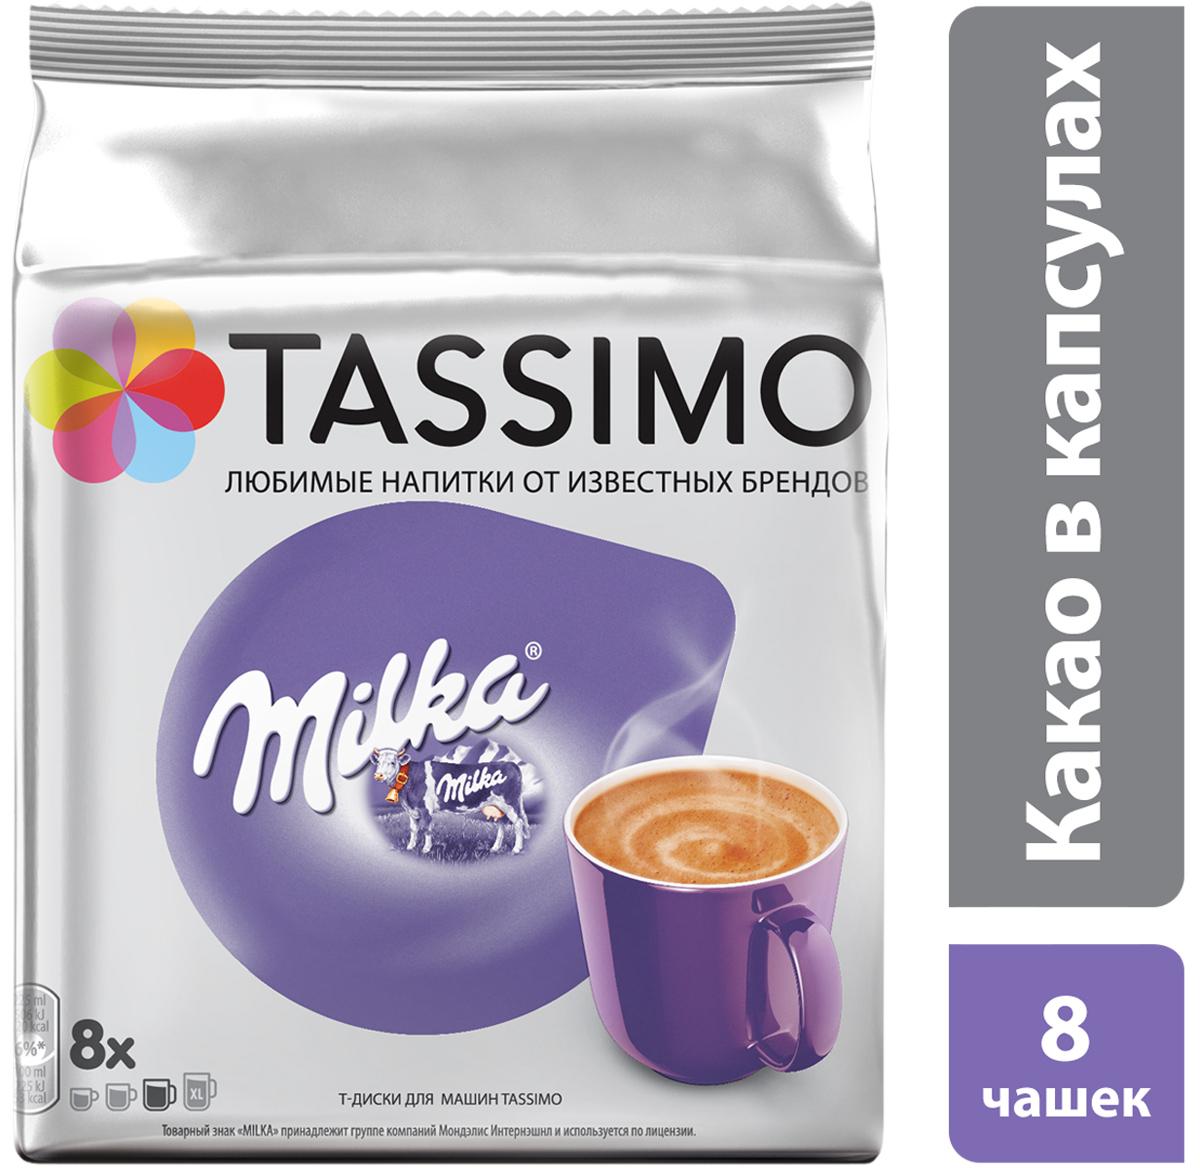 Tassimo Milka какао в капсулах, 8 шт кофе в капсулах tassimo карт нуар кафе лонг интенс 128г